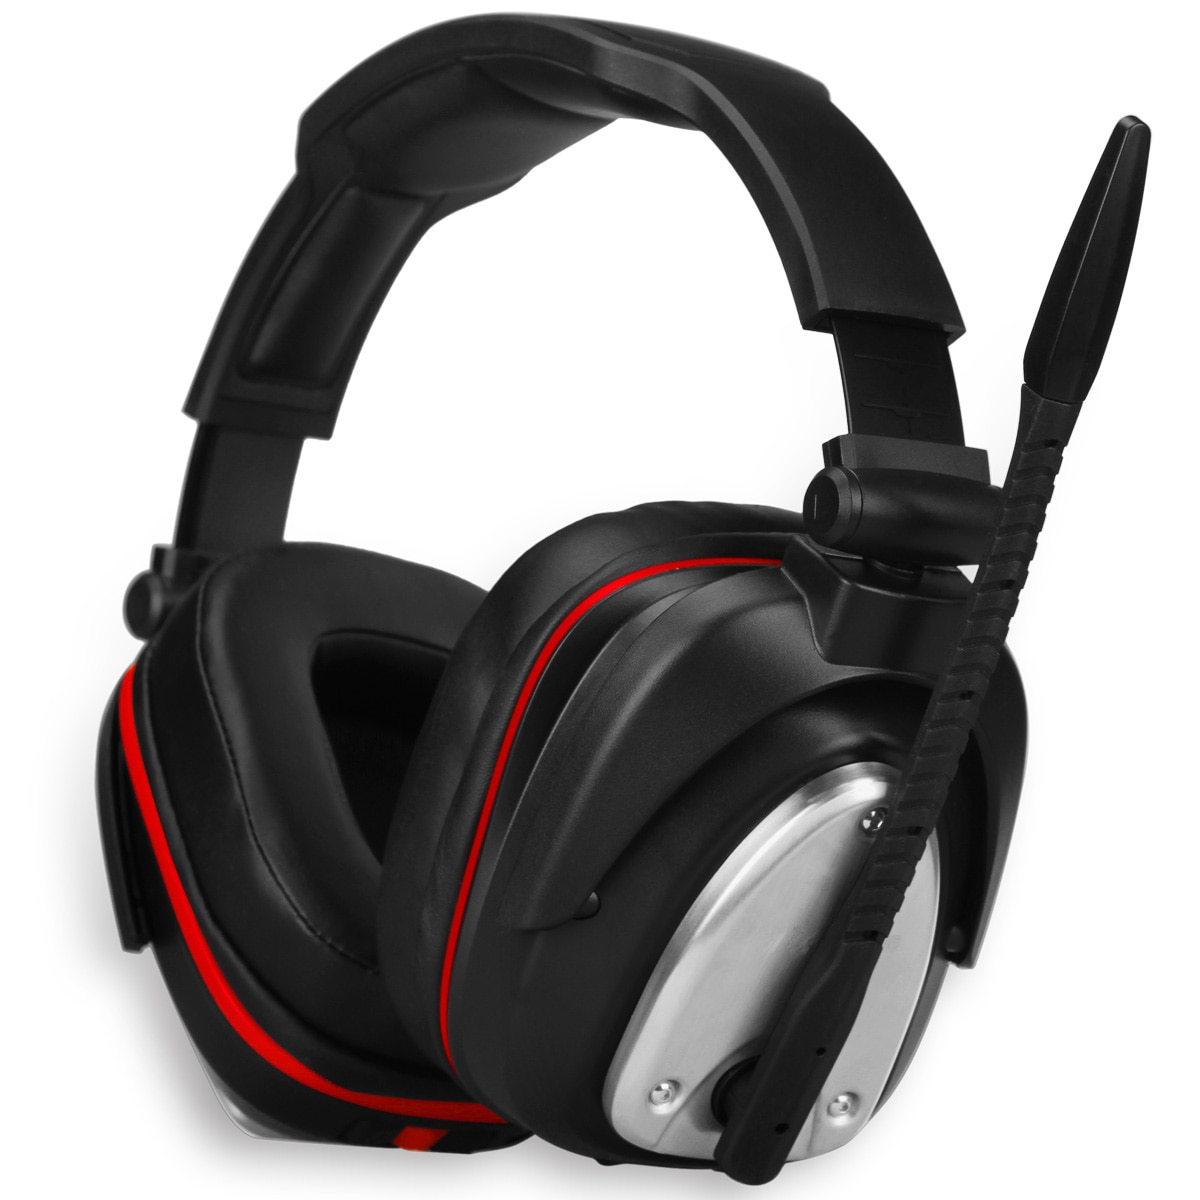 2.4G اللاسلكية الألعاب سماعات 7.1 الظاهري الصوت المحيطي طوي سماعات سماعة للكمبيوتر PS5 PS4 ماك التبديل مع ميكروفون